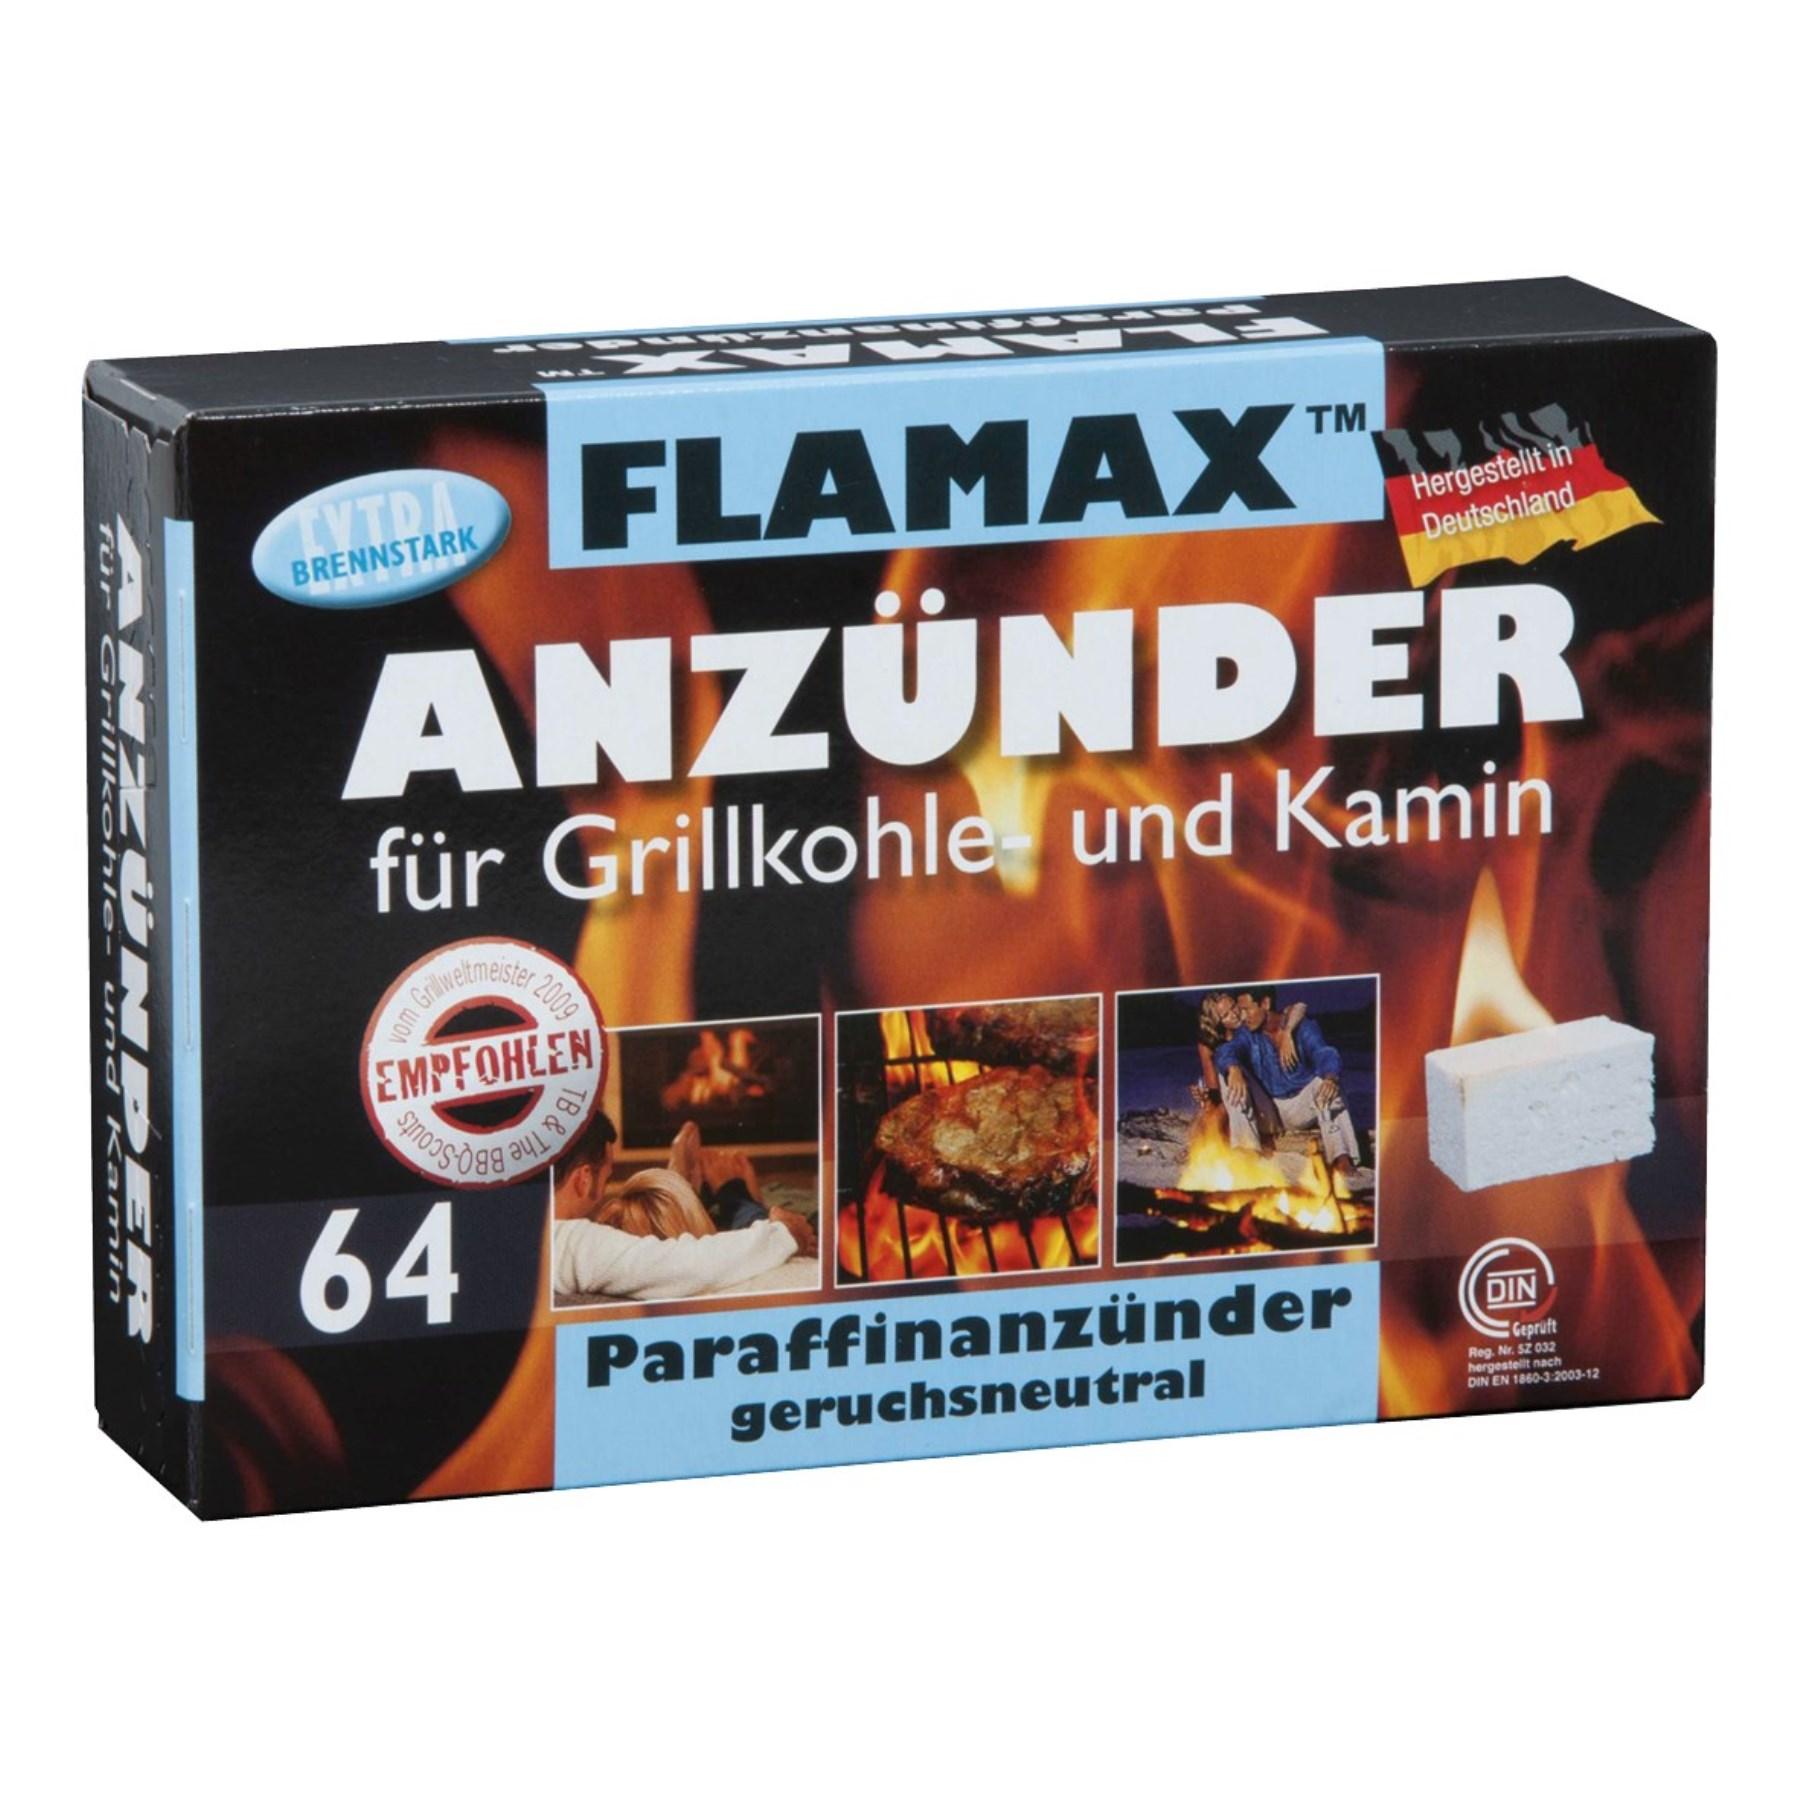 grill- und kaminanzünder, 64 würfel (1219365) - let's doit - starke